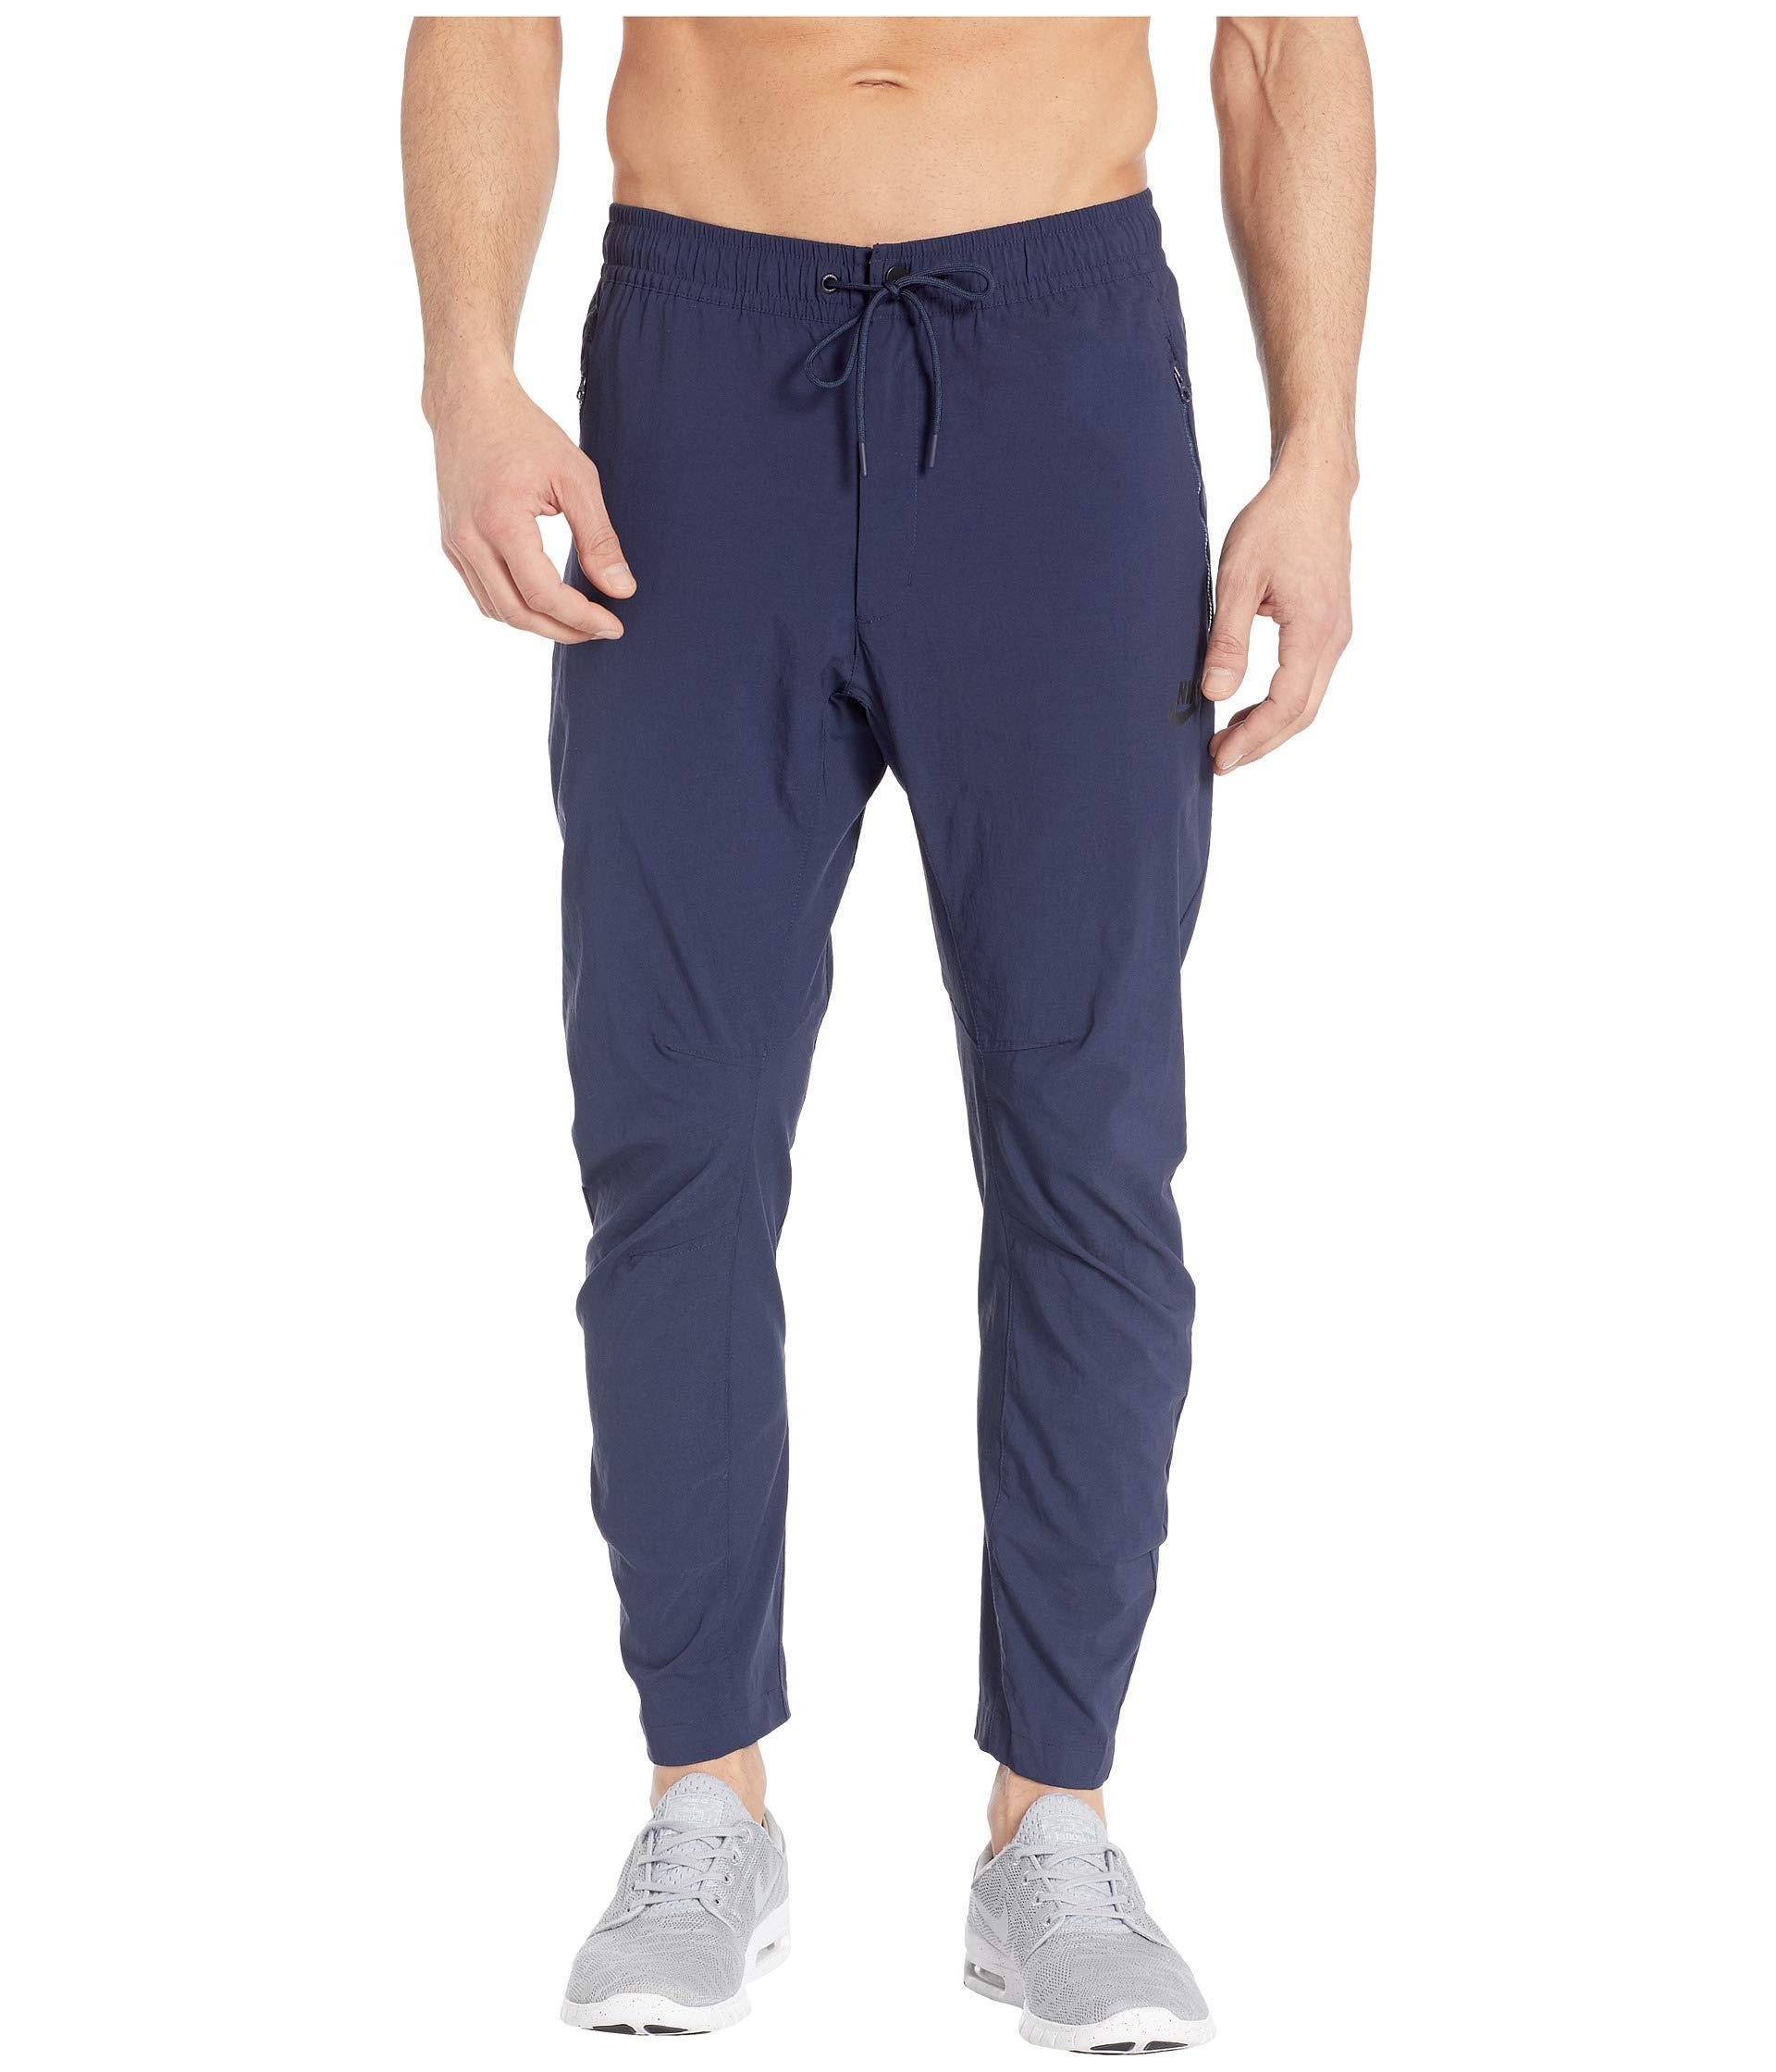 03bab4ca5c9 Lyst - Nike Nsw Woven Statement Street Pants (black black) Men s ...